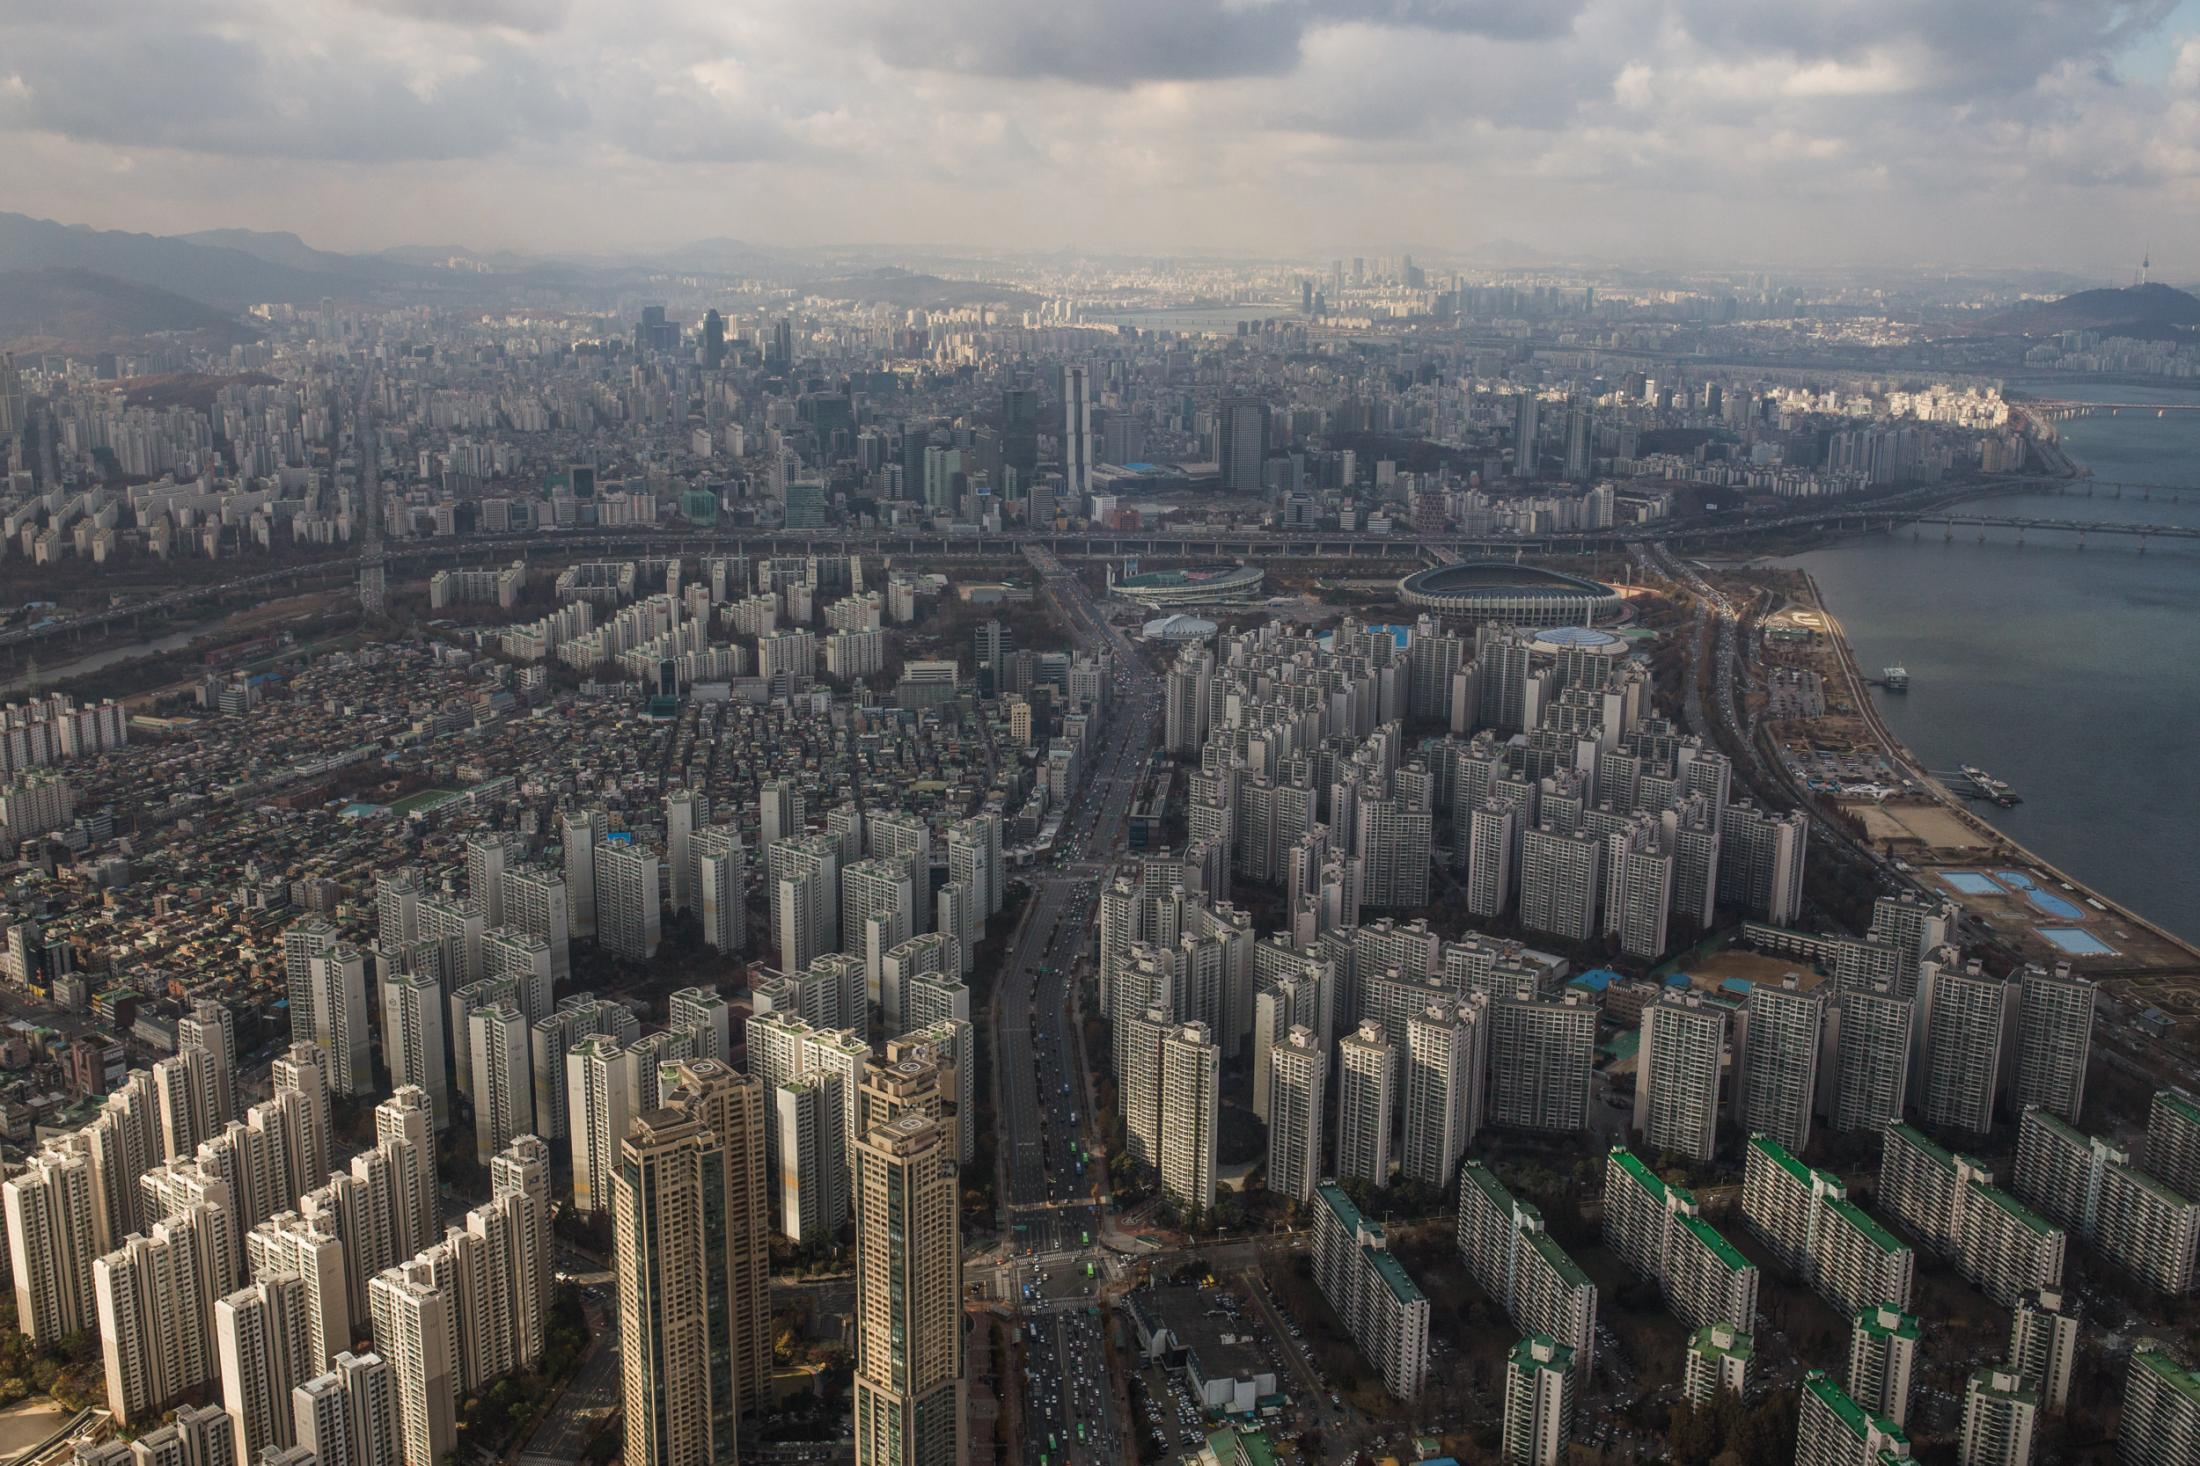 The city of Seoul.